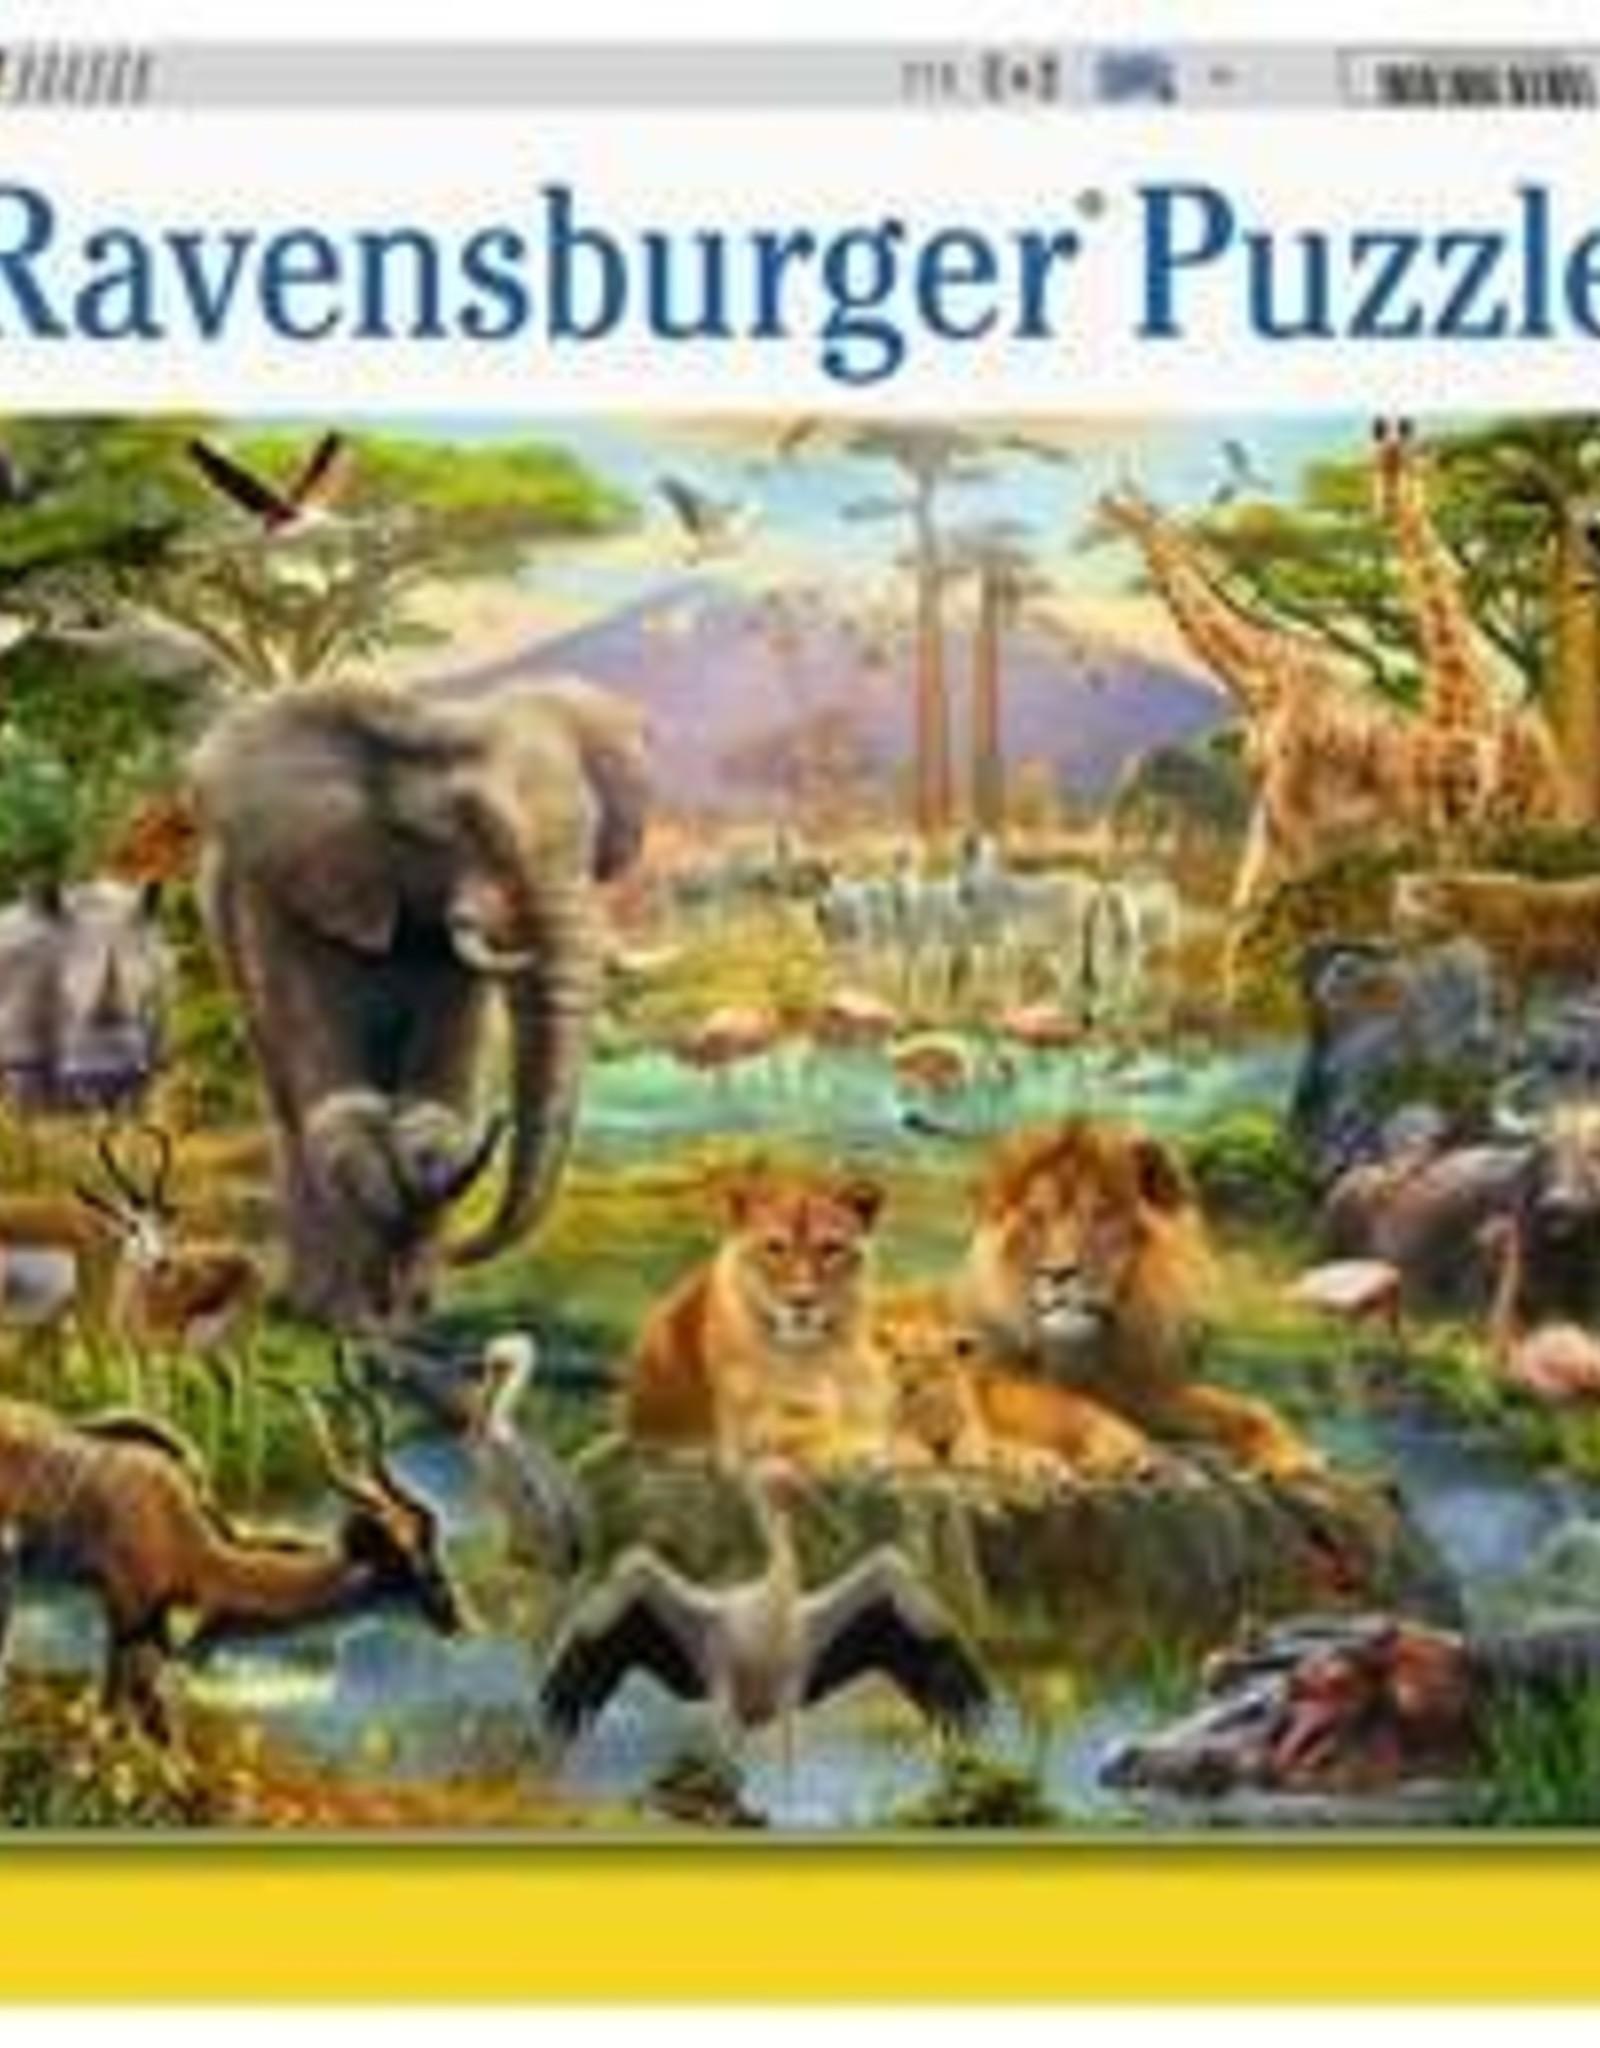 Ravensburger 200pc Animals of the Savannah